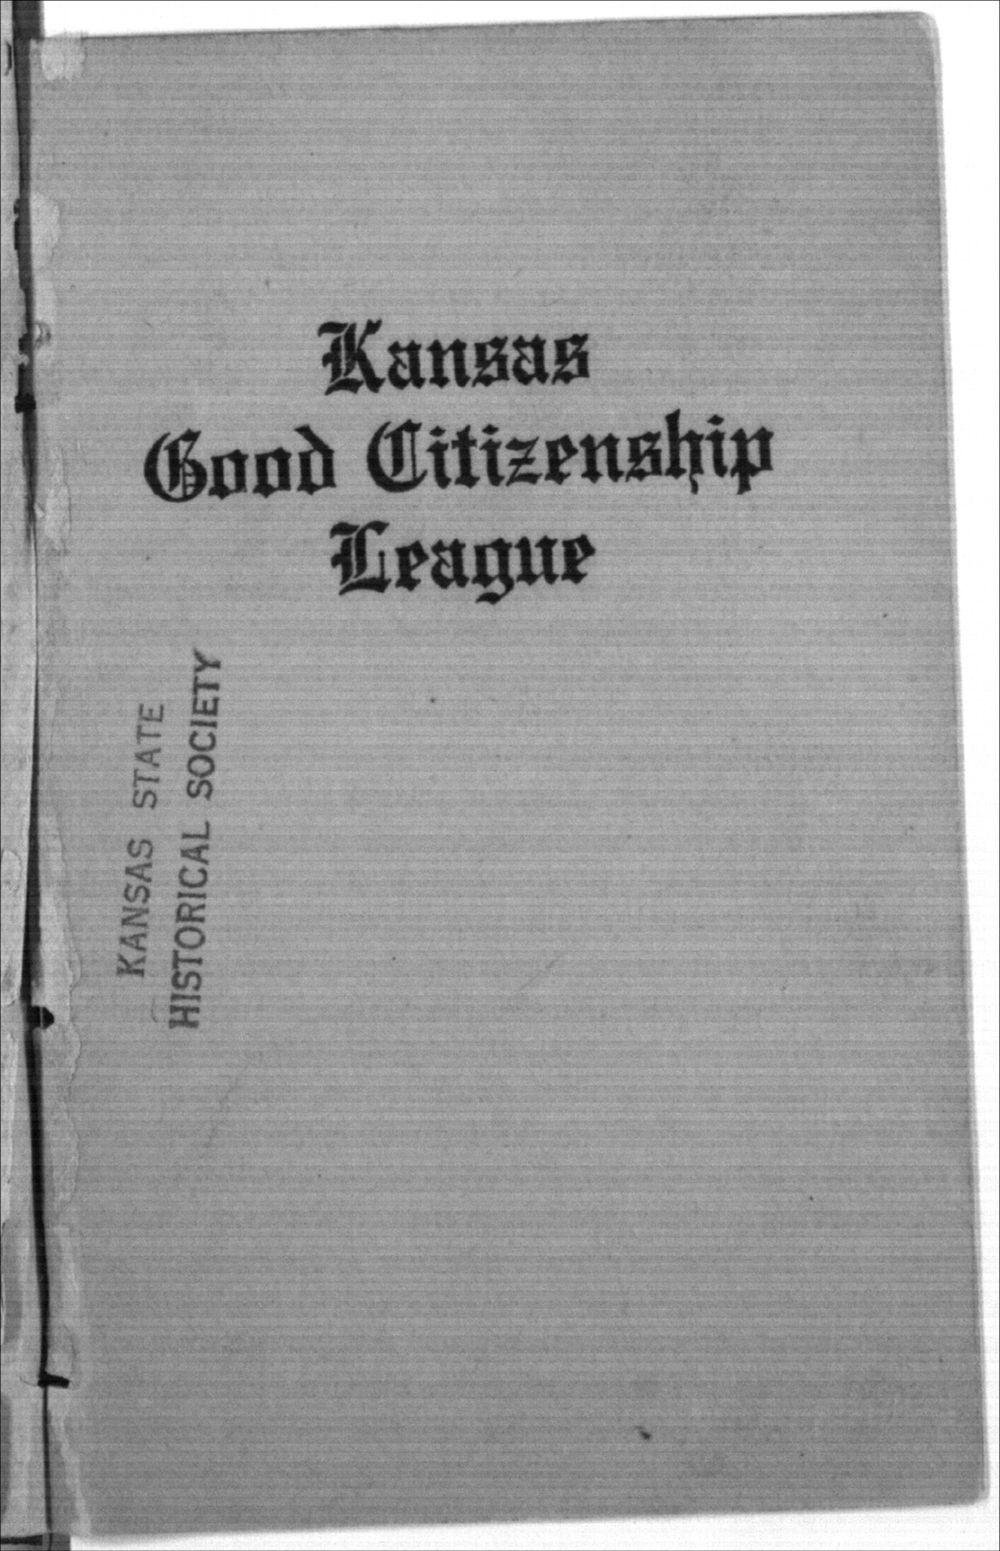 Kansas Good Citizenship League, Inter-State Suffrage Banquet - Front Cover